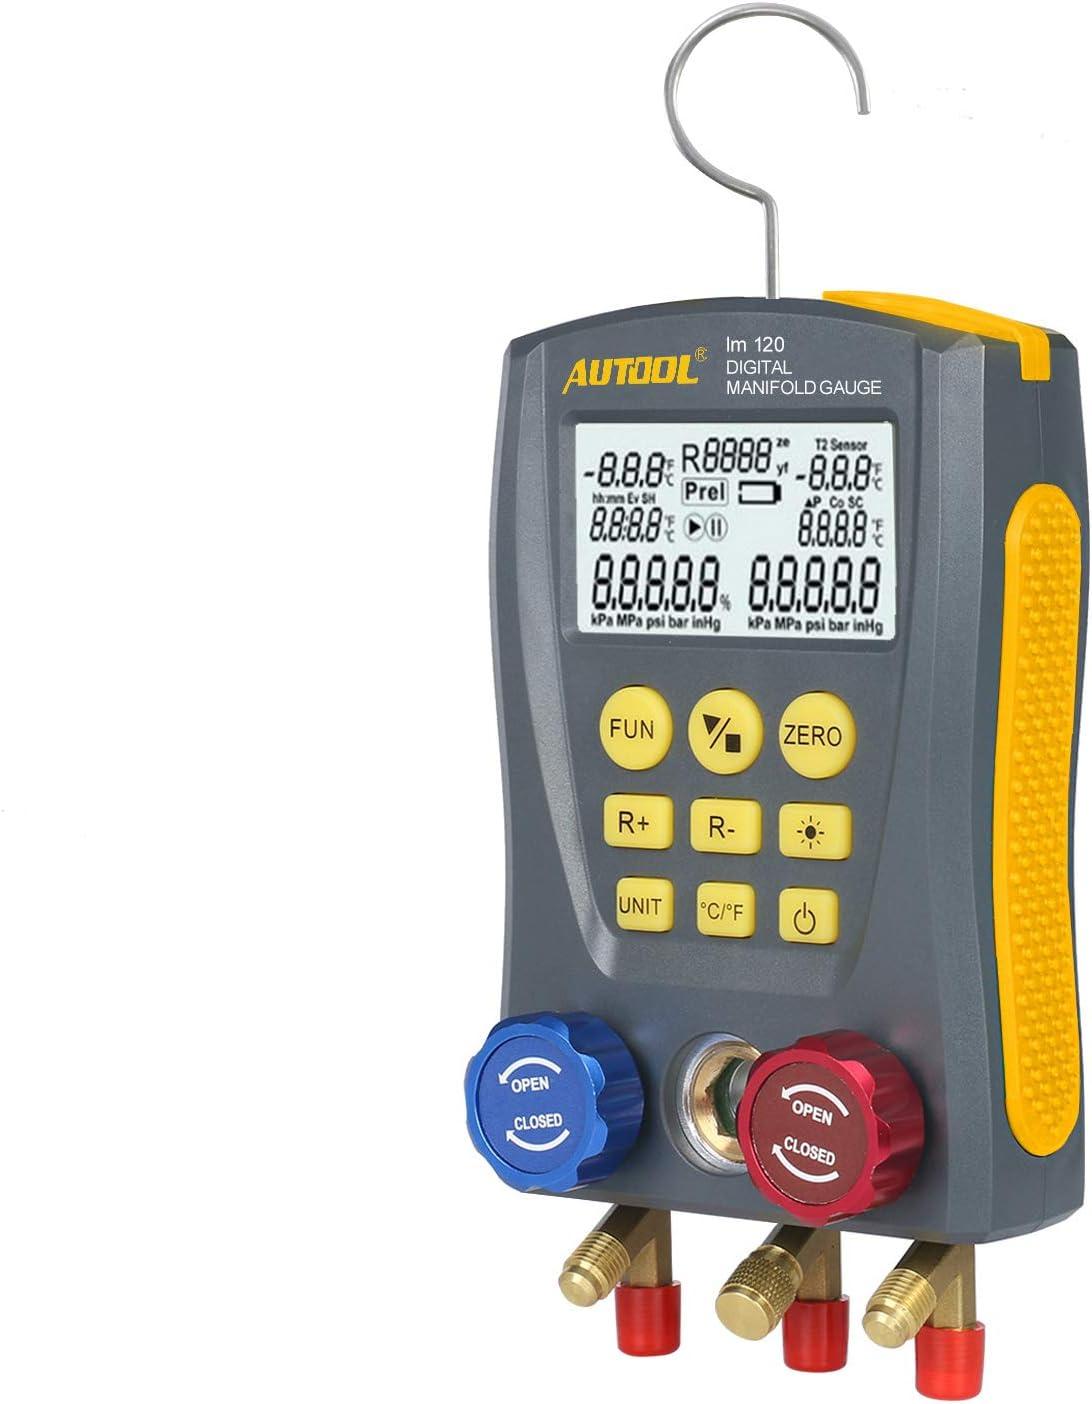 BELEY AUTOOL Refrigeration Digital Manifold HVAC System Gauge Set High-Precision Vacuum Pressure Temperature Leakage Tester Dignostic Meter Kit